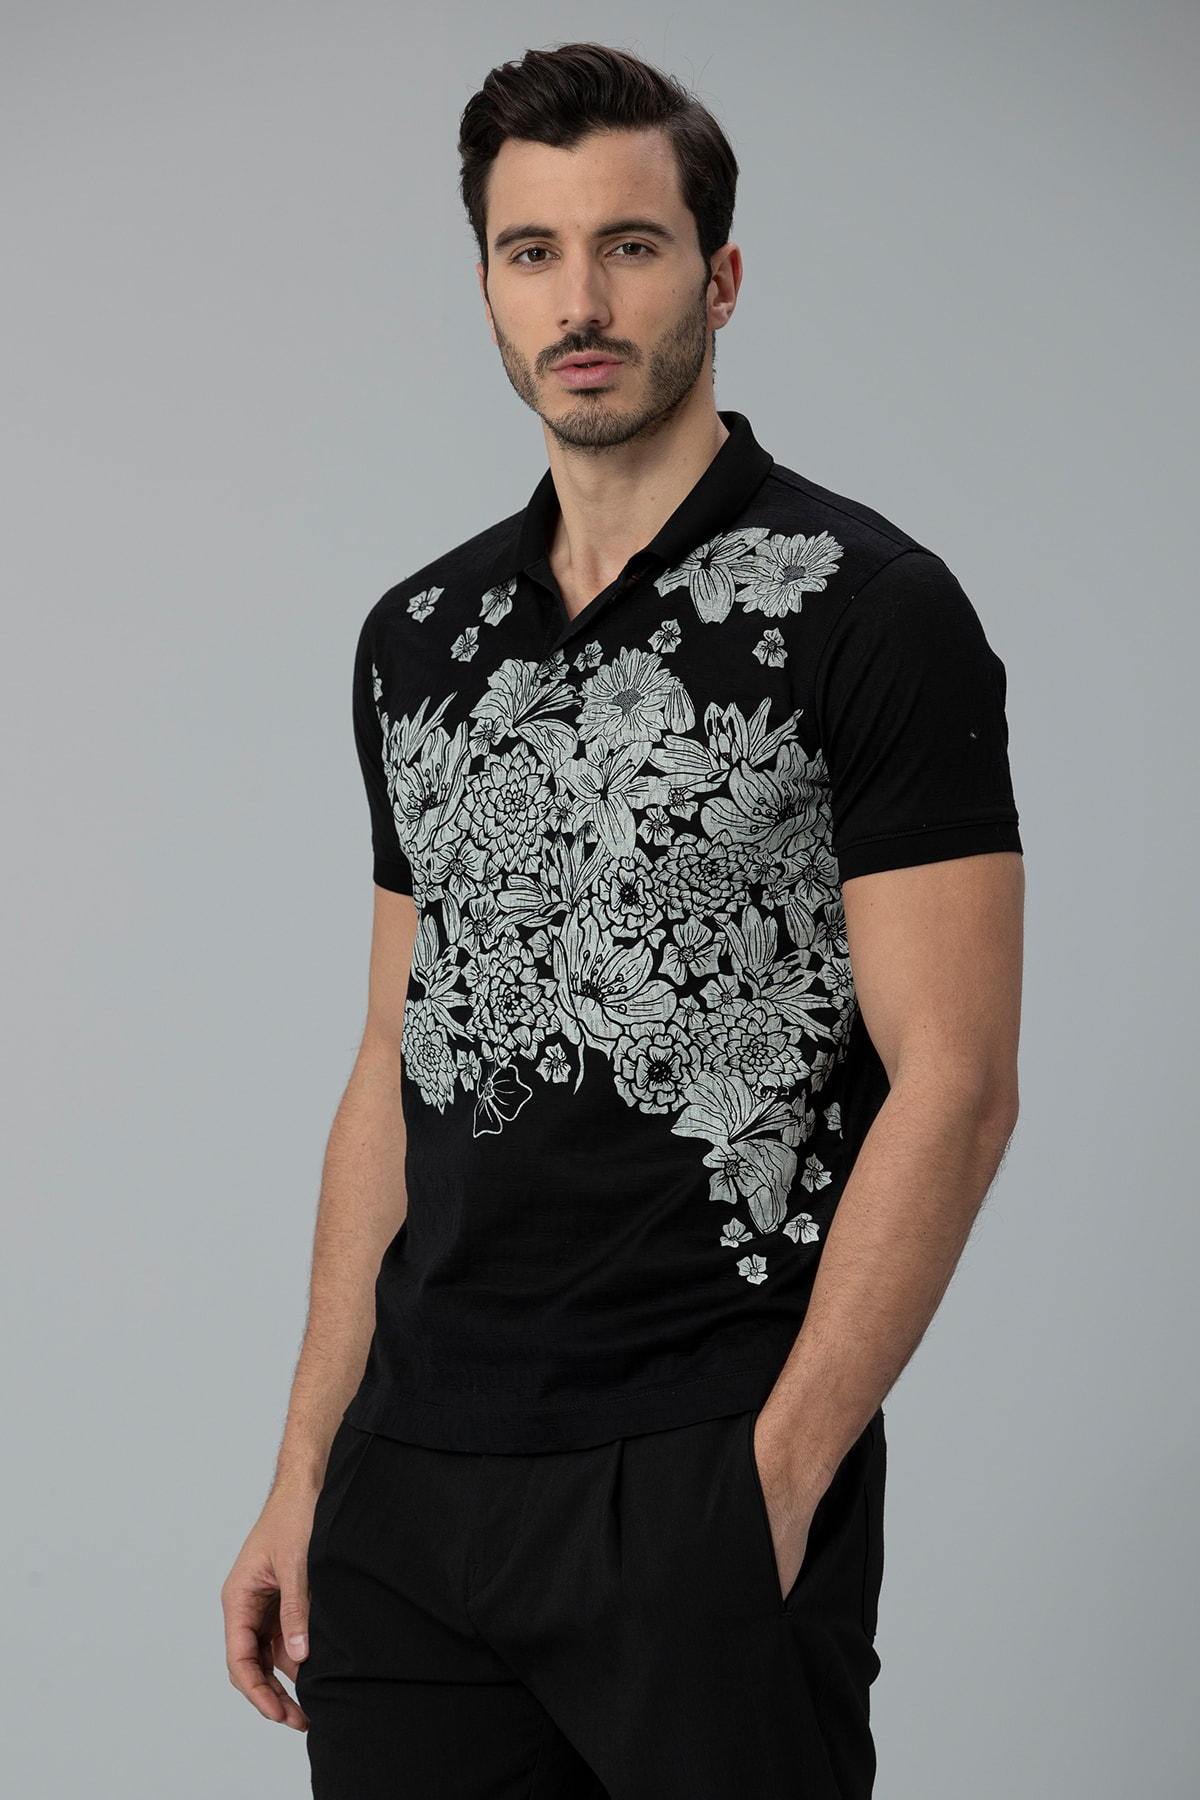 Lufian Matera Spor Polo T- Shirt Siyah 0